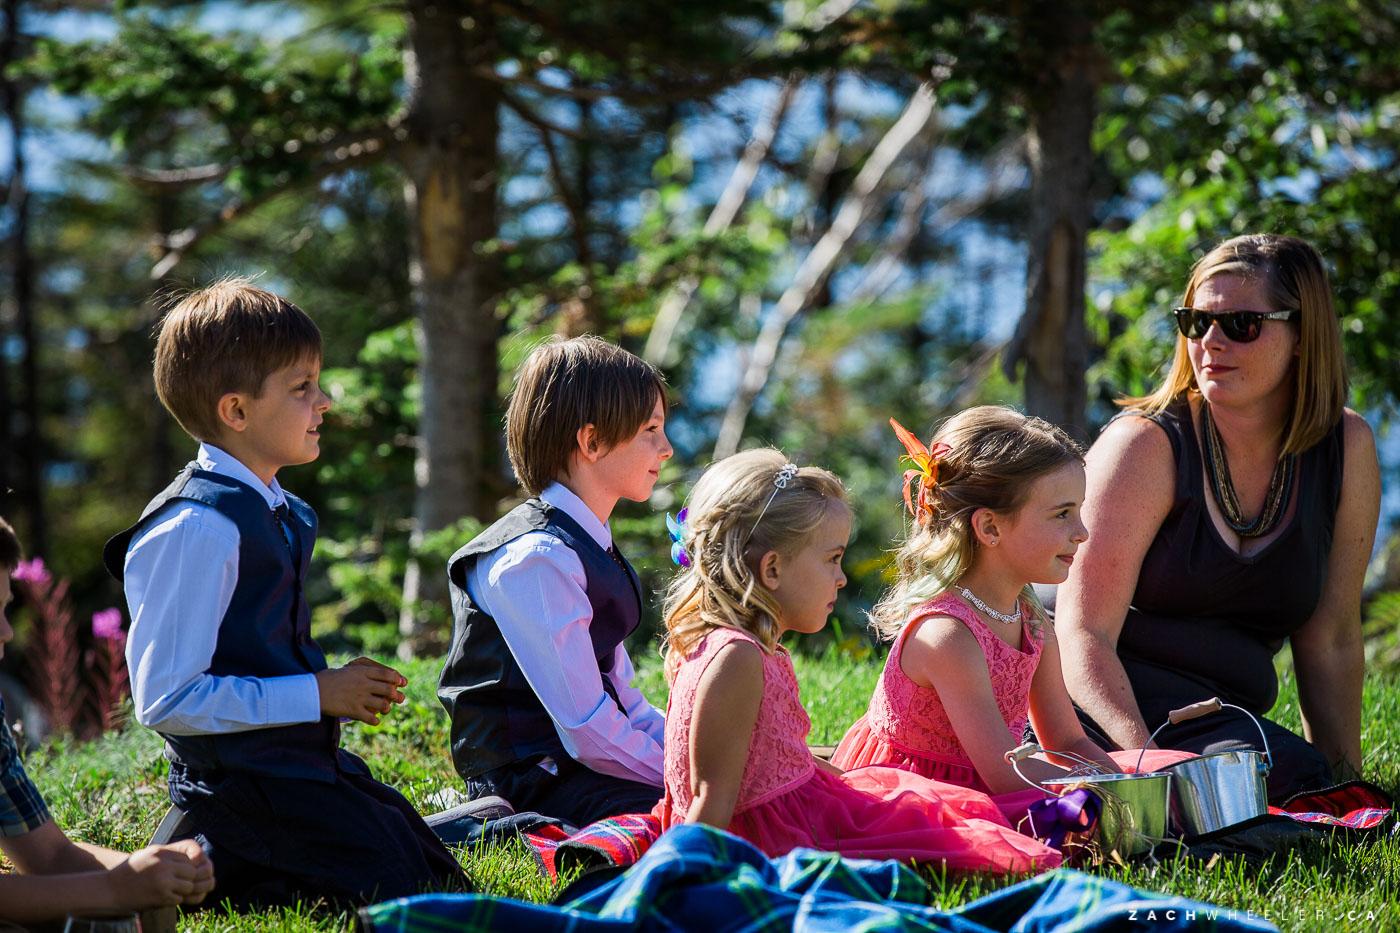 StJohns-Newfoundland-Backyard-Wedding-21